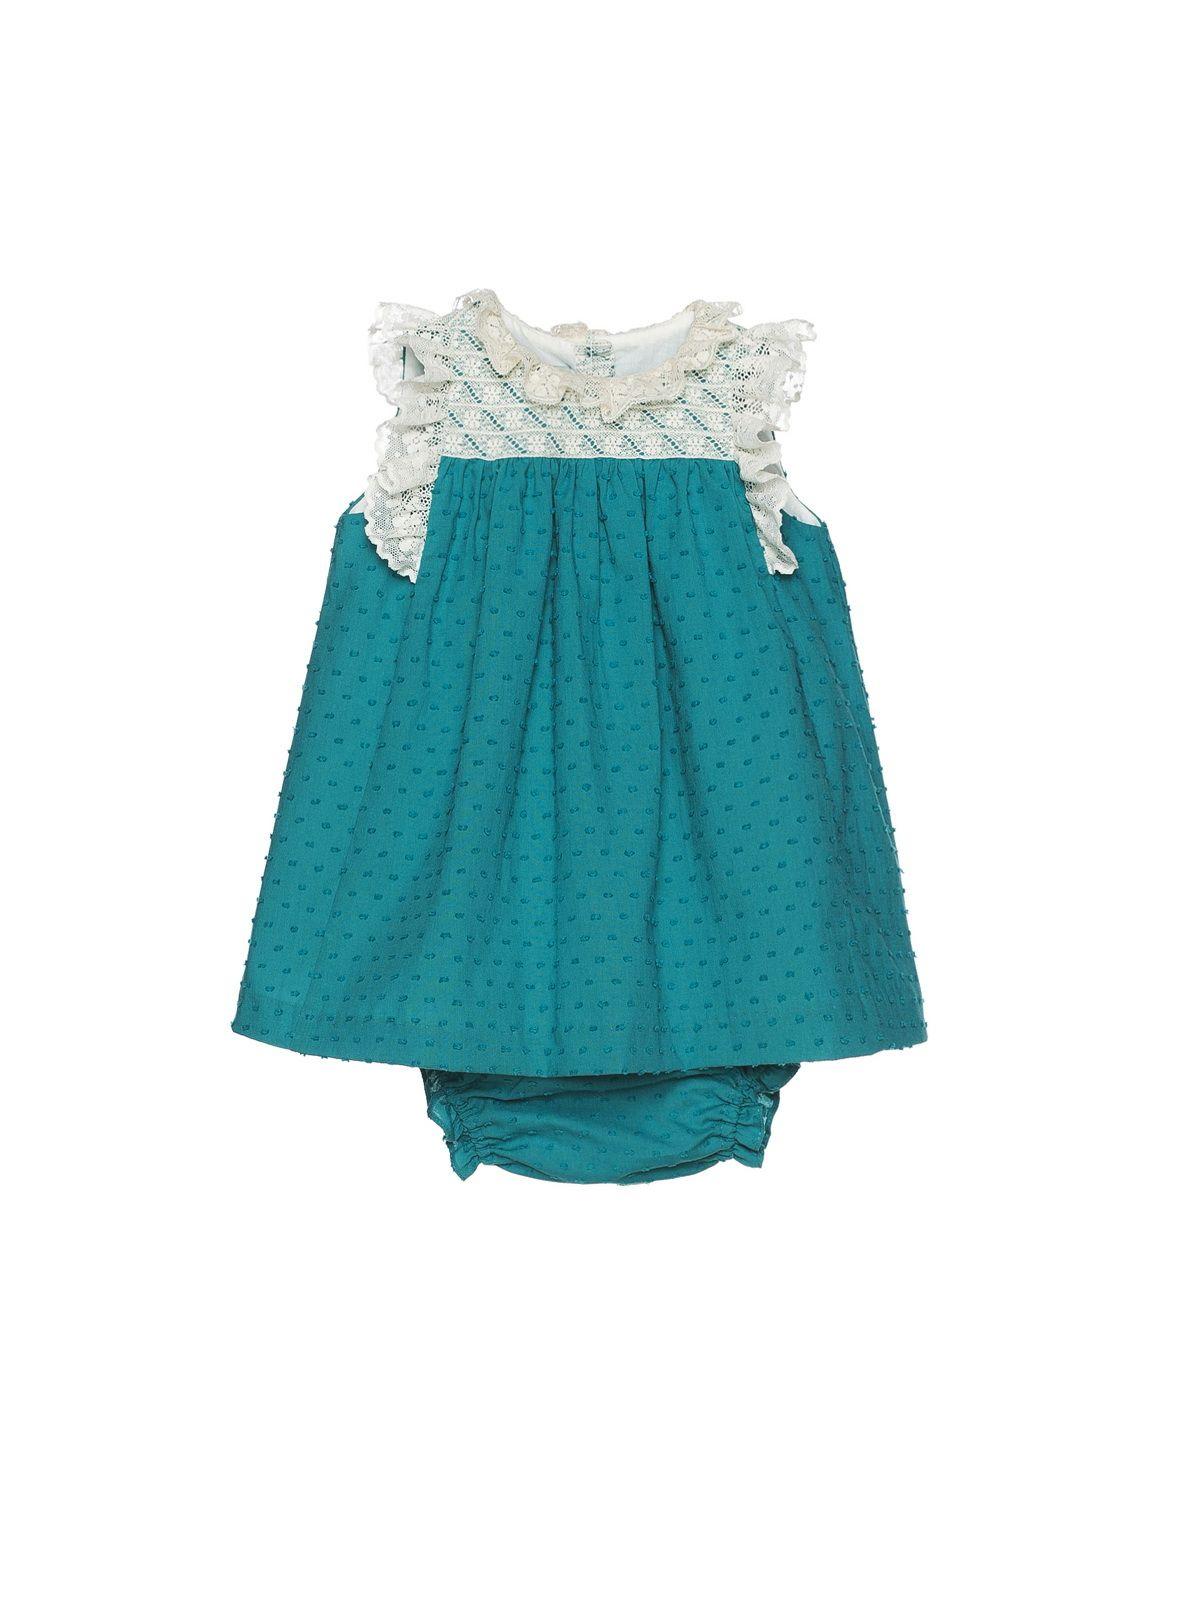 45ad7d68 NANOS SHOP ONLINE. Detalle | sewing dresses for a girl | Ropa bebe ...